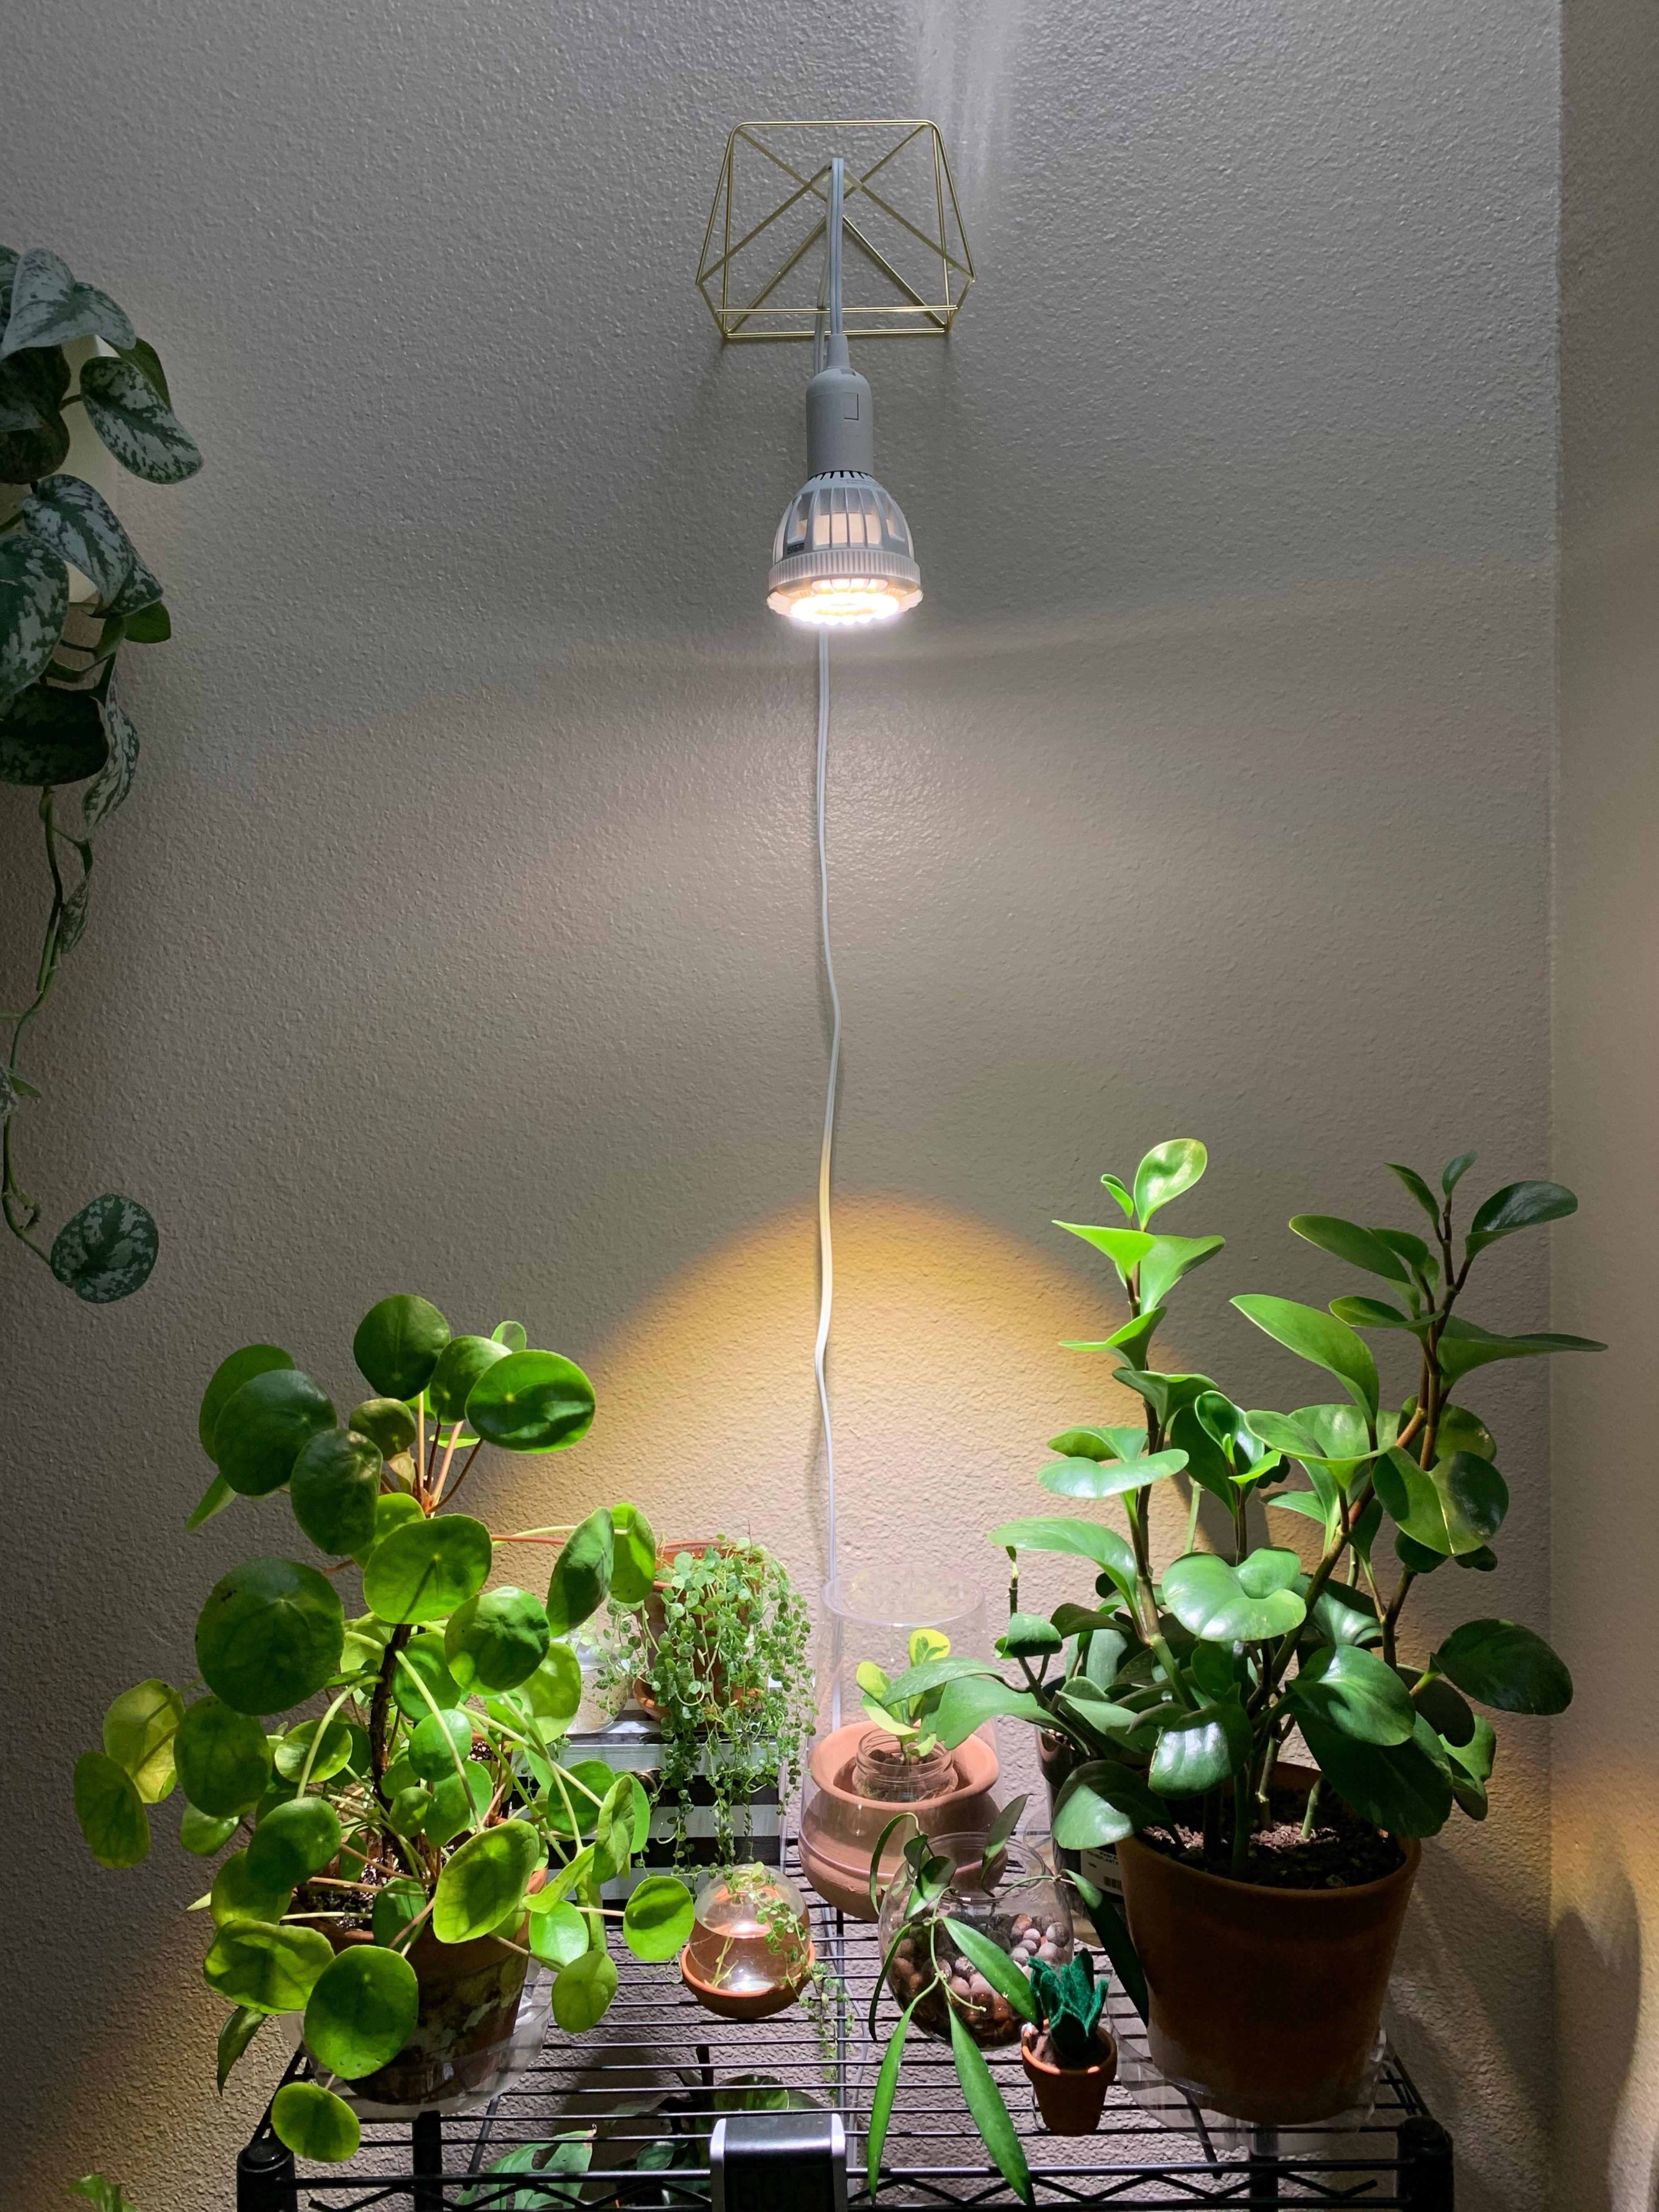 Grow Houseplants Even If You Live In A North Facing Apartment Grow Lights For Plants Indoor Grow Lights Grow Light Bulbs